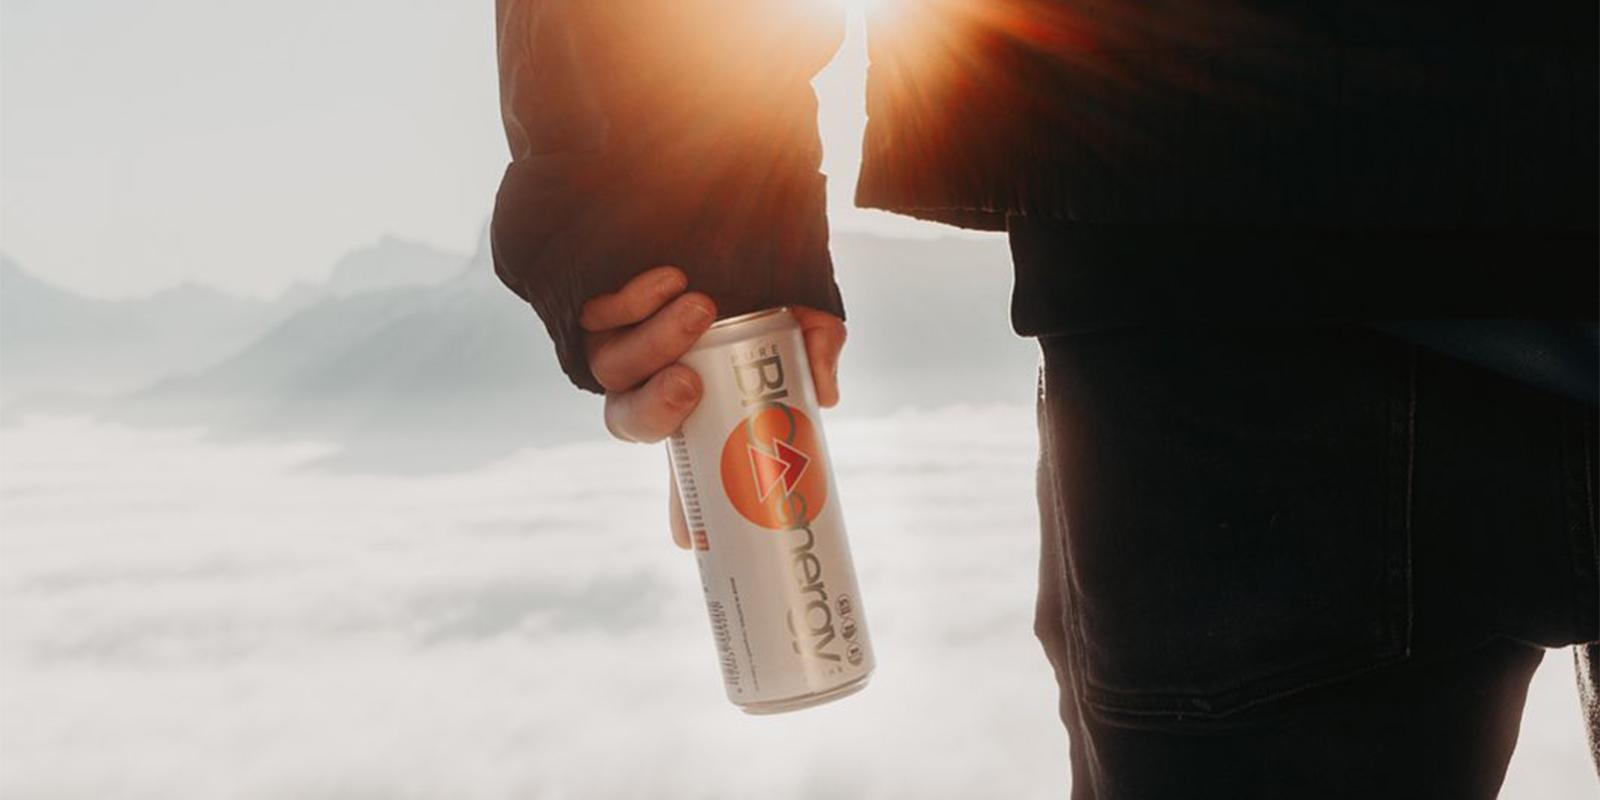 pure BIO Energy drink